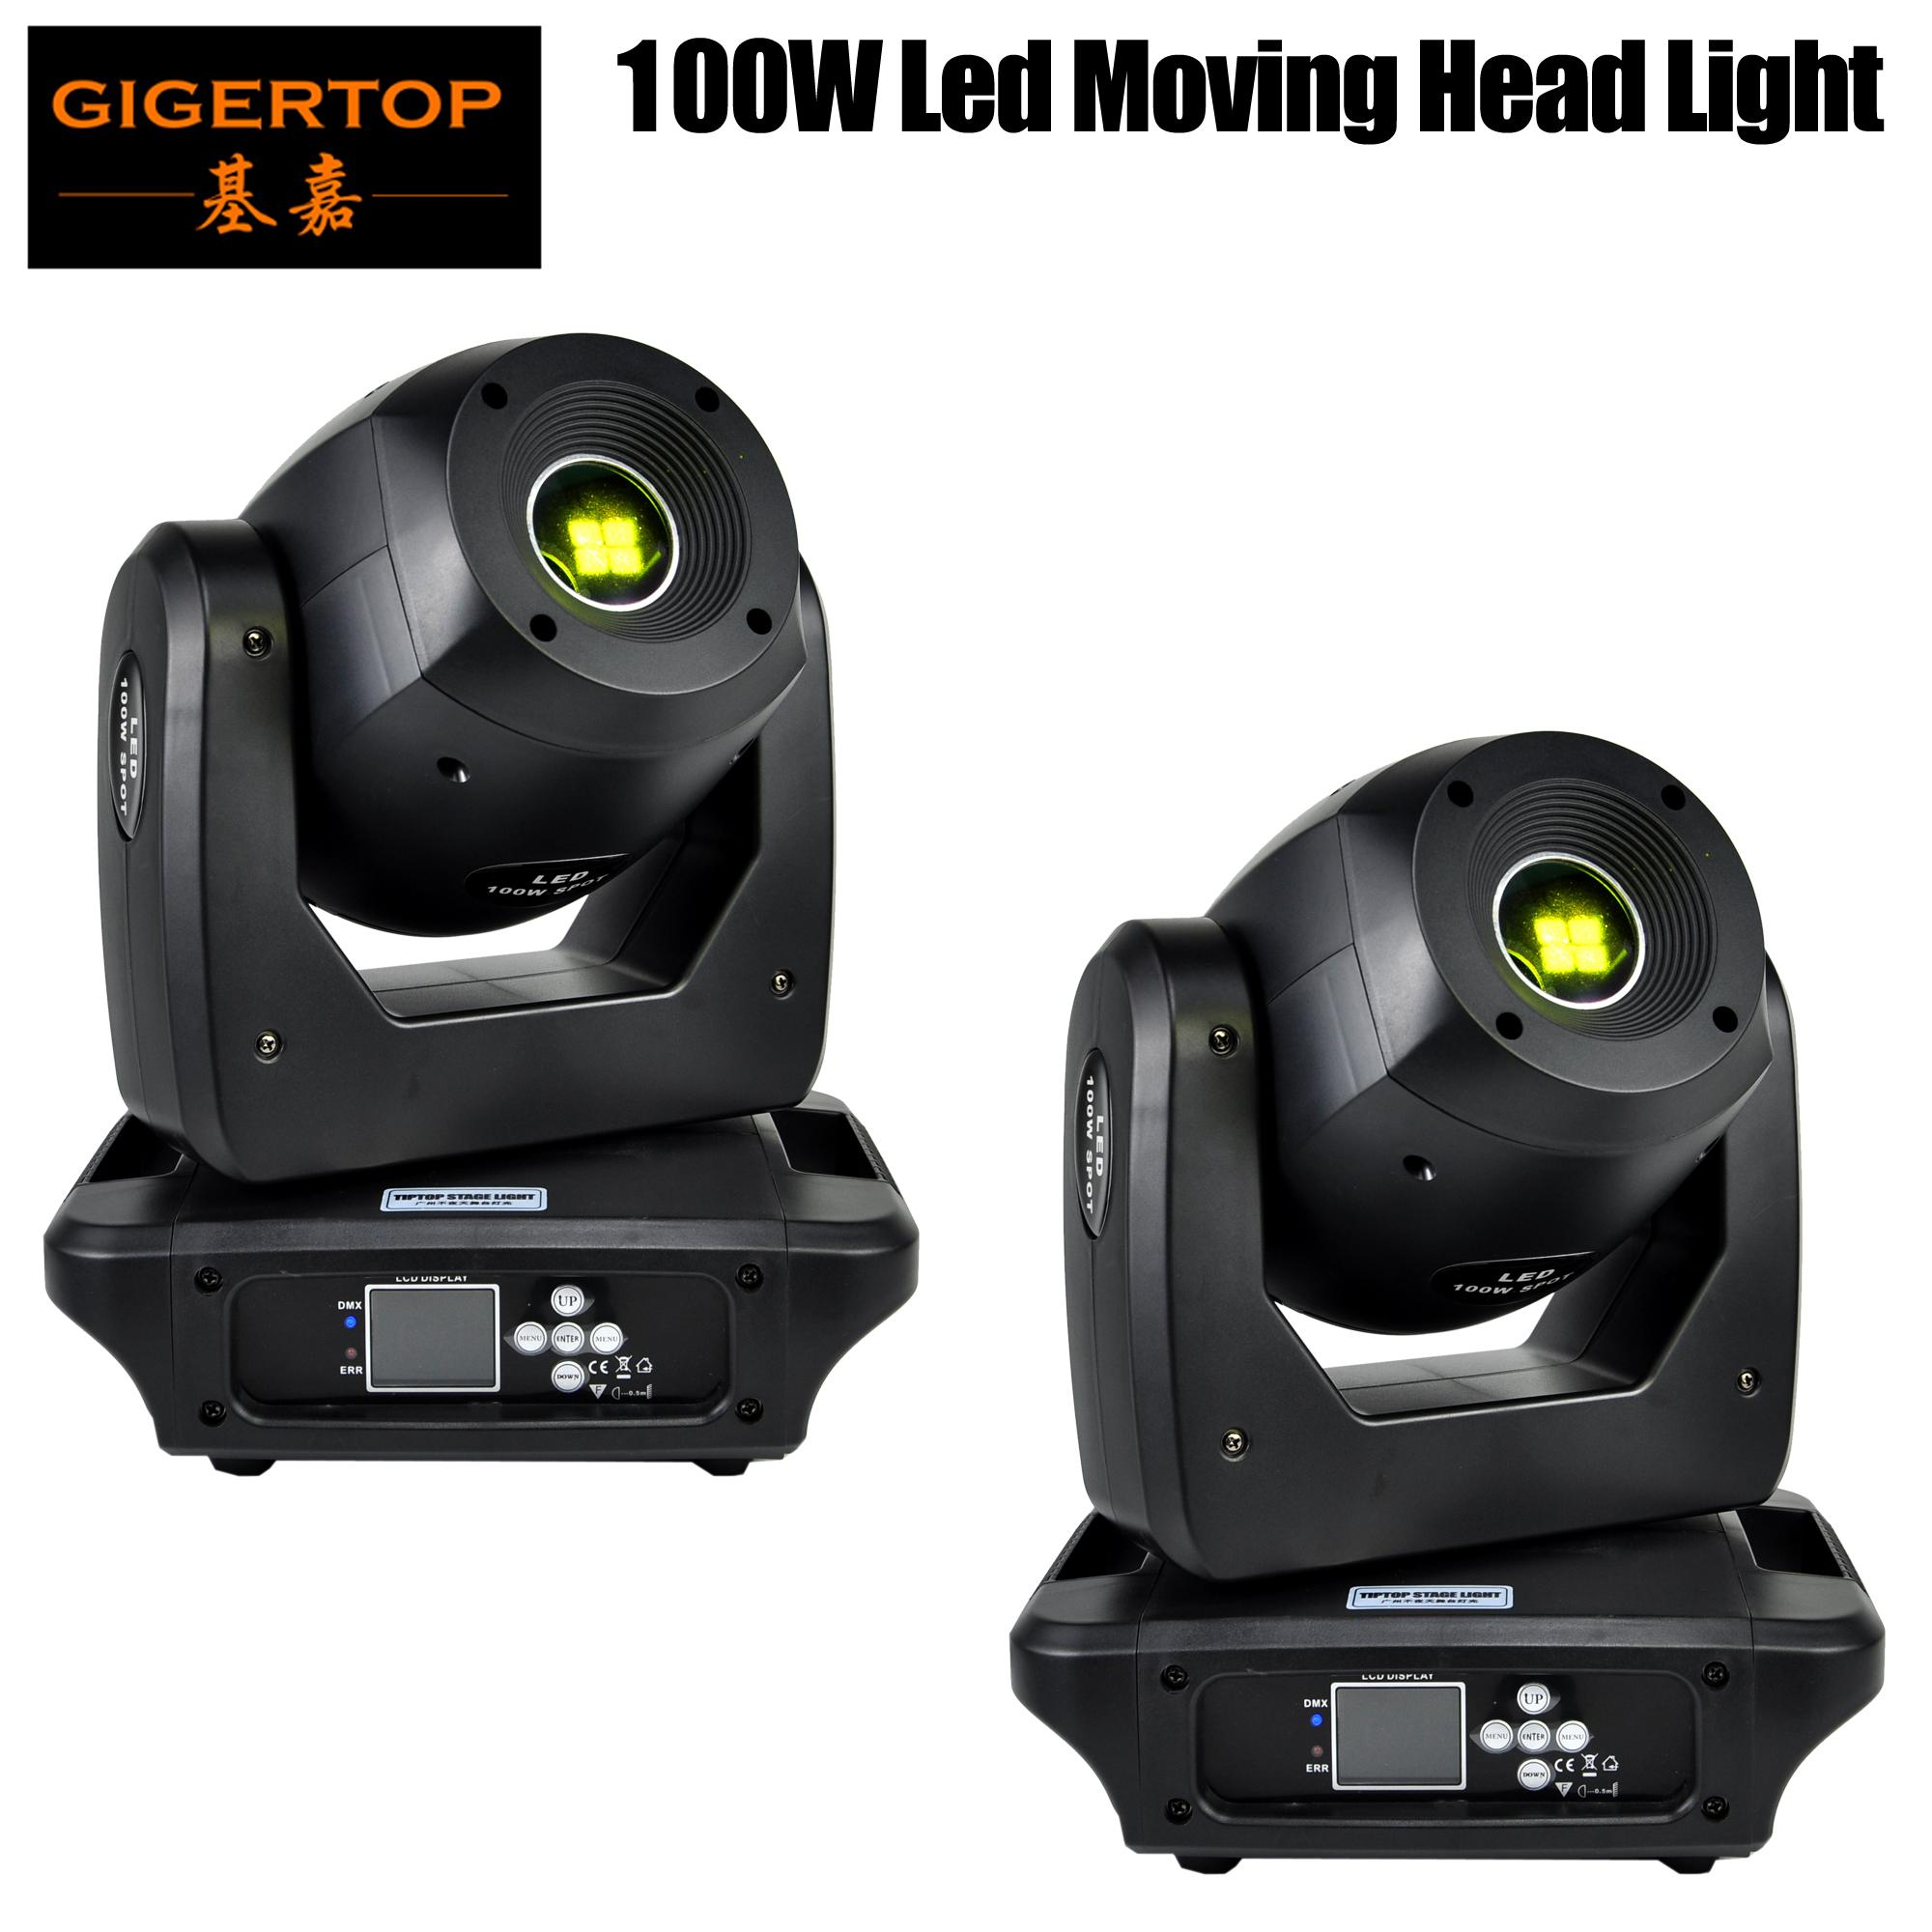 TIPTOP 2Lot 2019 새로운 100W LED RGBW 무대 조명 조명 헤드 라이트를 이동하는 13 개 채널 DMX DJ 무대 디스코 빛 파티 축제 장식